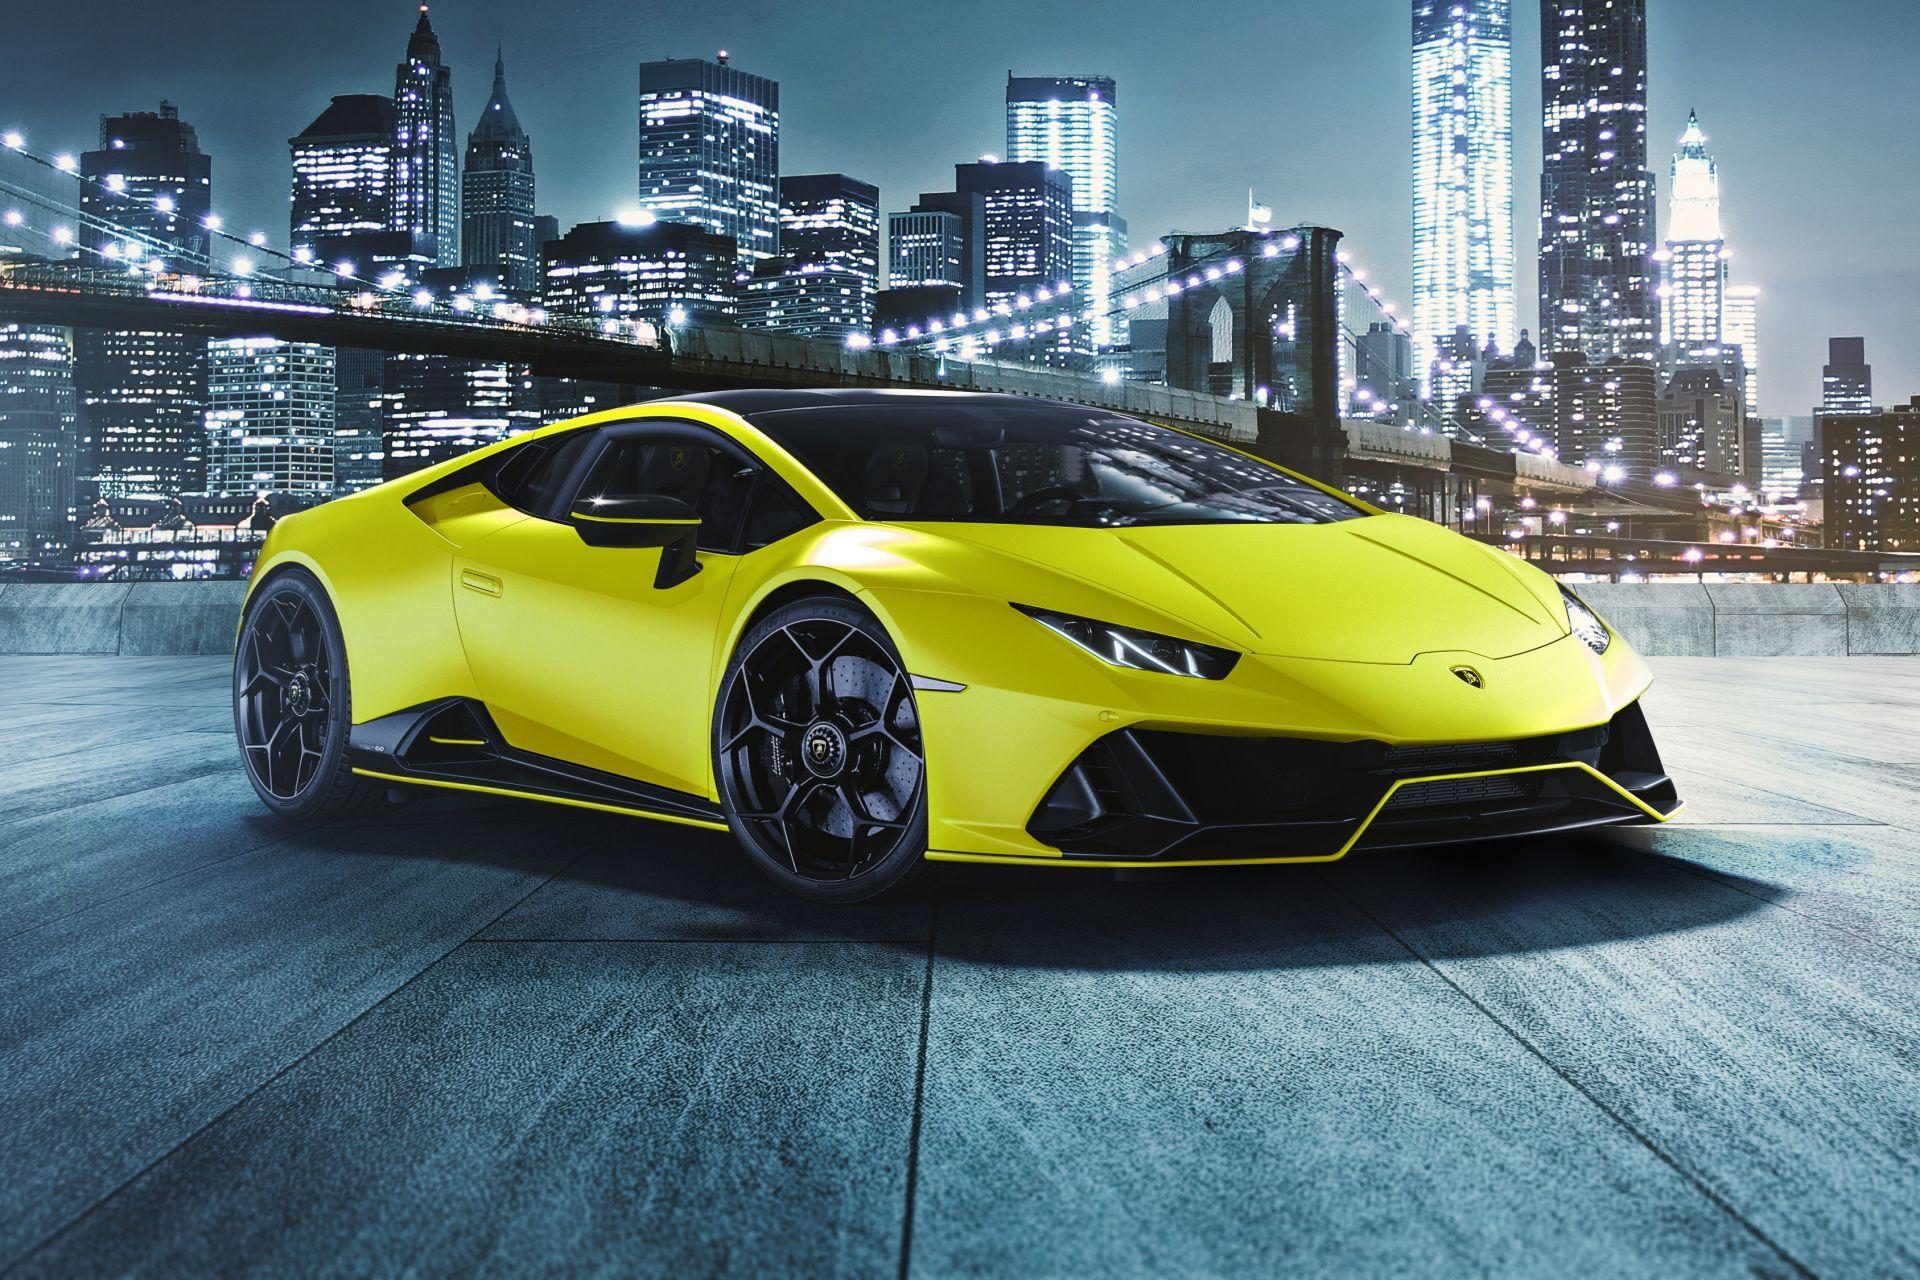 Lamborghini-Huracan-Evo-Fluo-Capsule-3